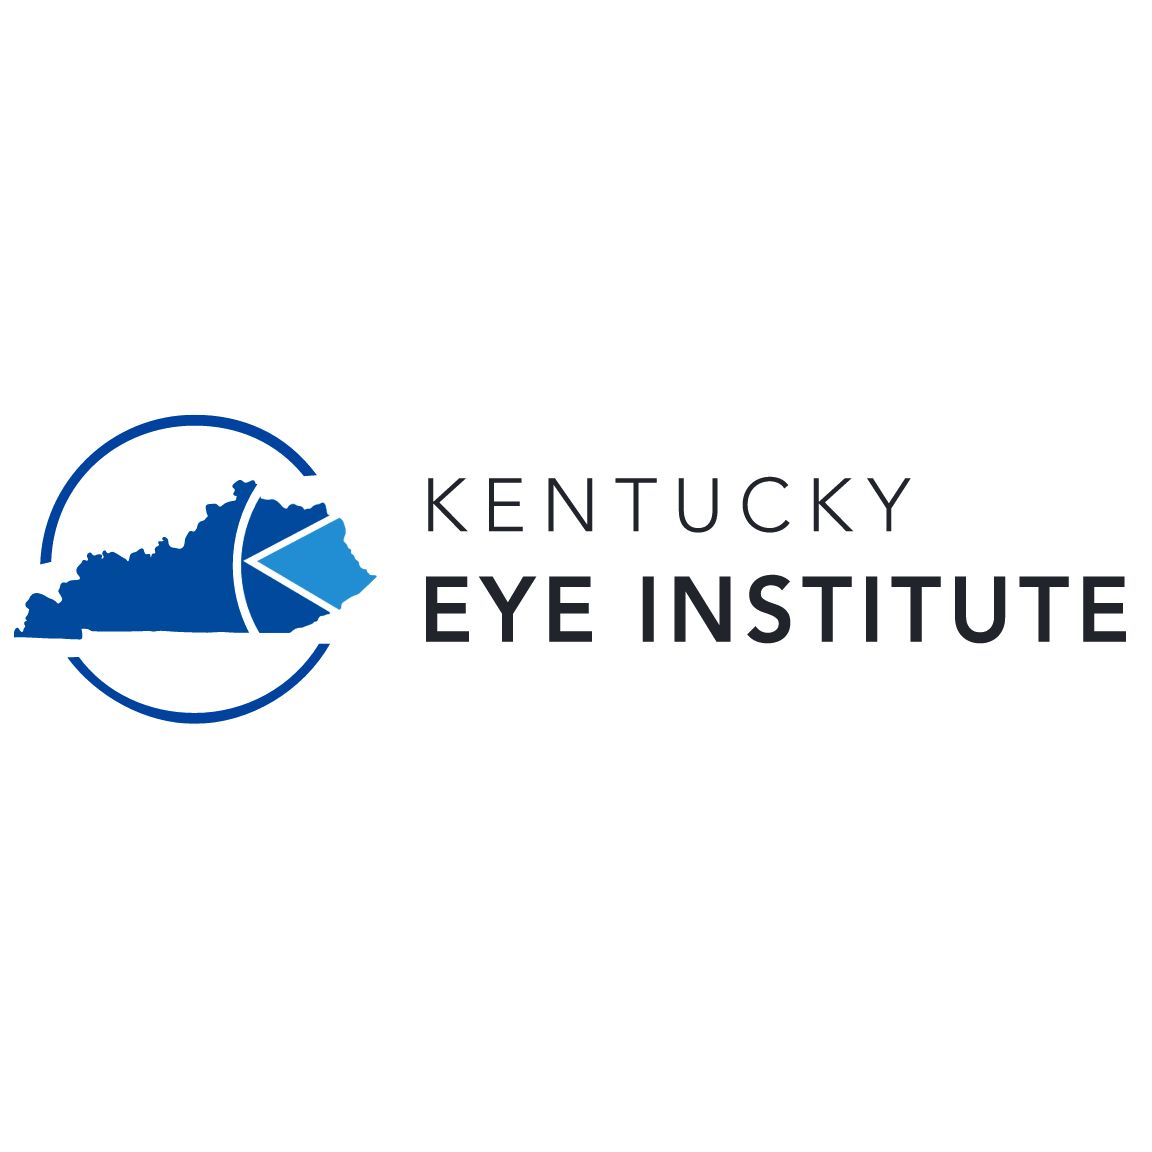 Kentucky Eye Institute 601 Perimeter Drive Suite 100